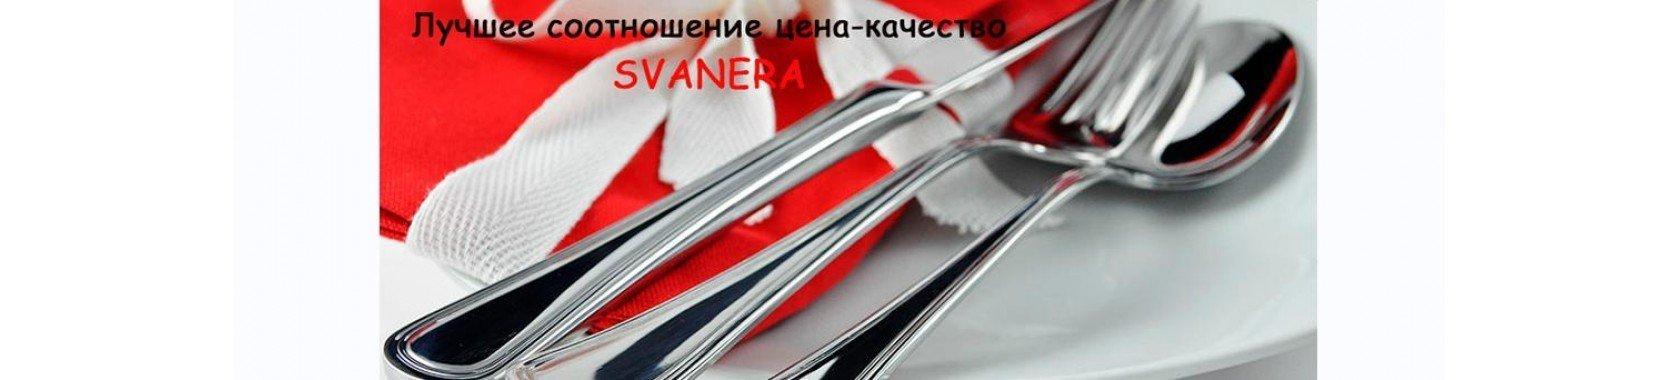 Svanera столовые приборы